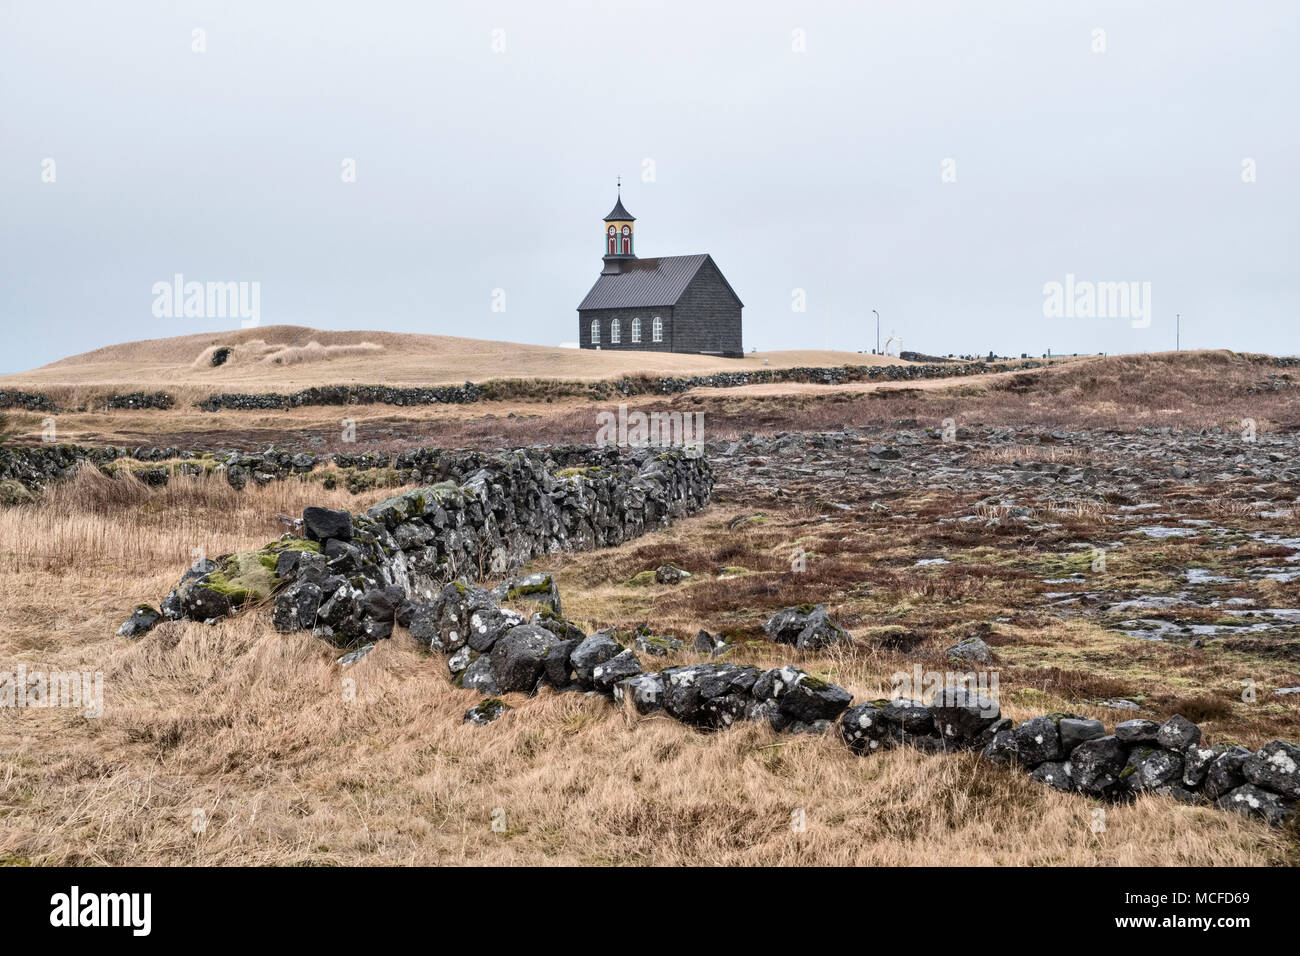 Sur la péninsule de Reykjanes, l'Islande. Hvalsnes church, (Hvalsneskirkja), Sandgerði, construite en 1887 de pierre de basalte noir Photo Stock